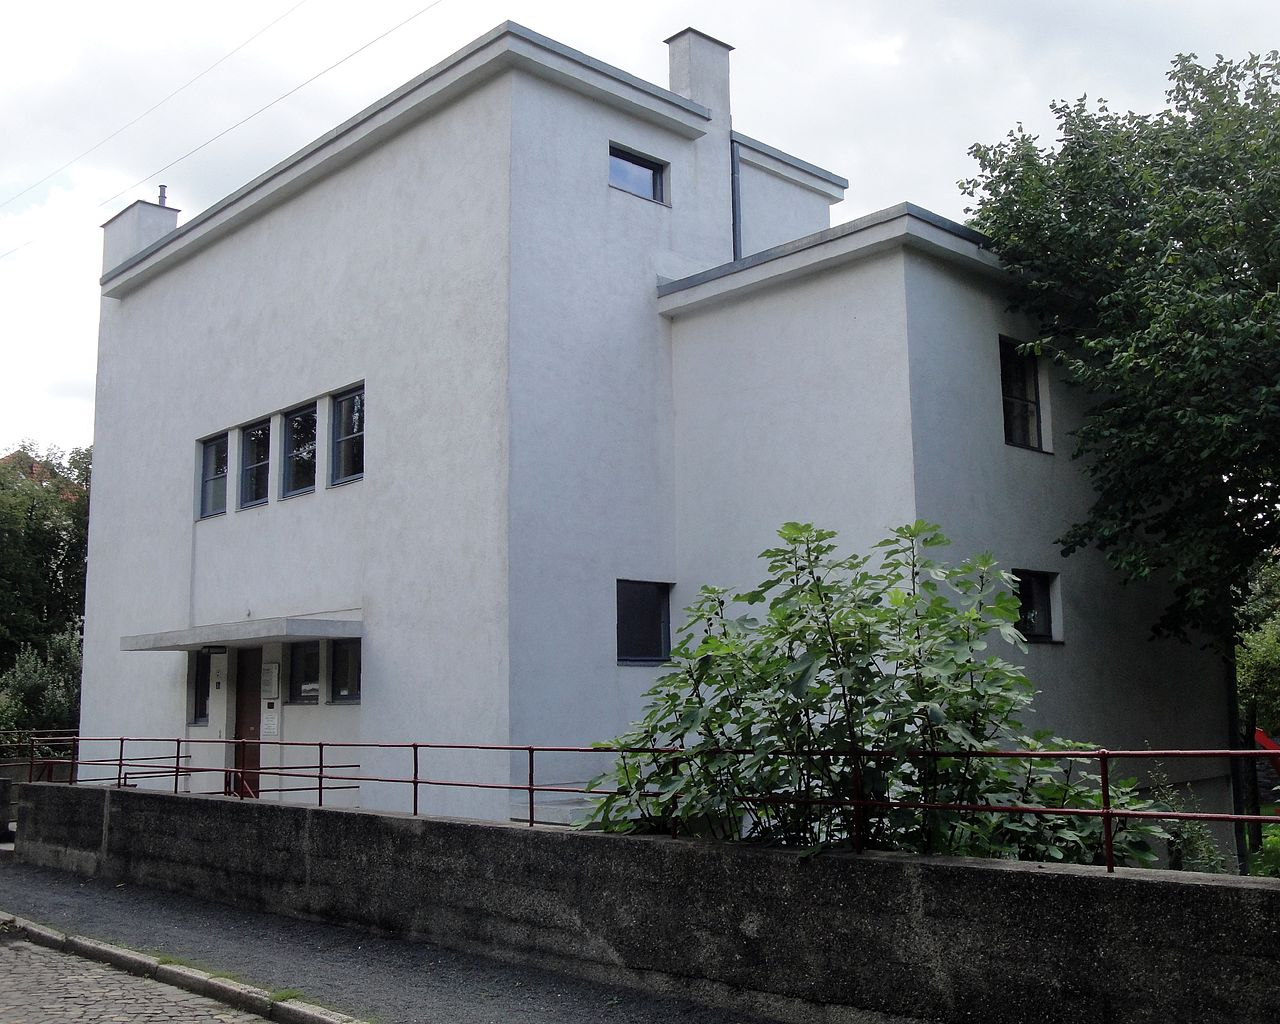 Bild Haus Auerbach Jena